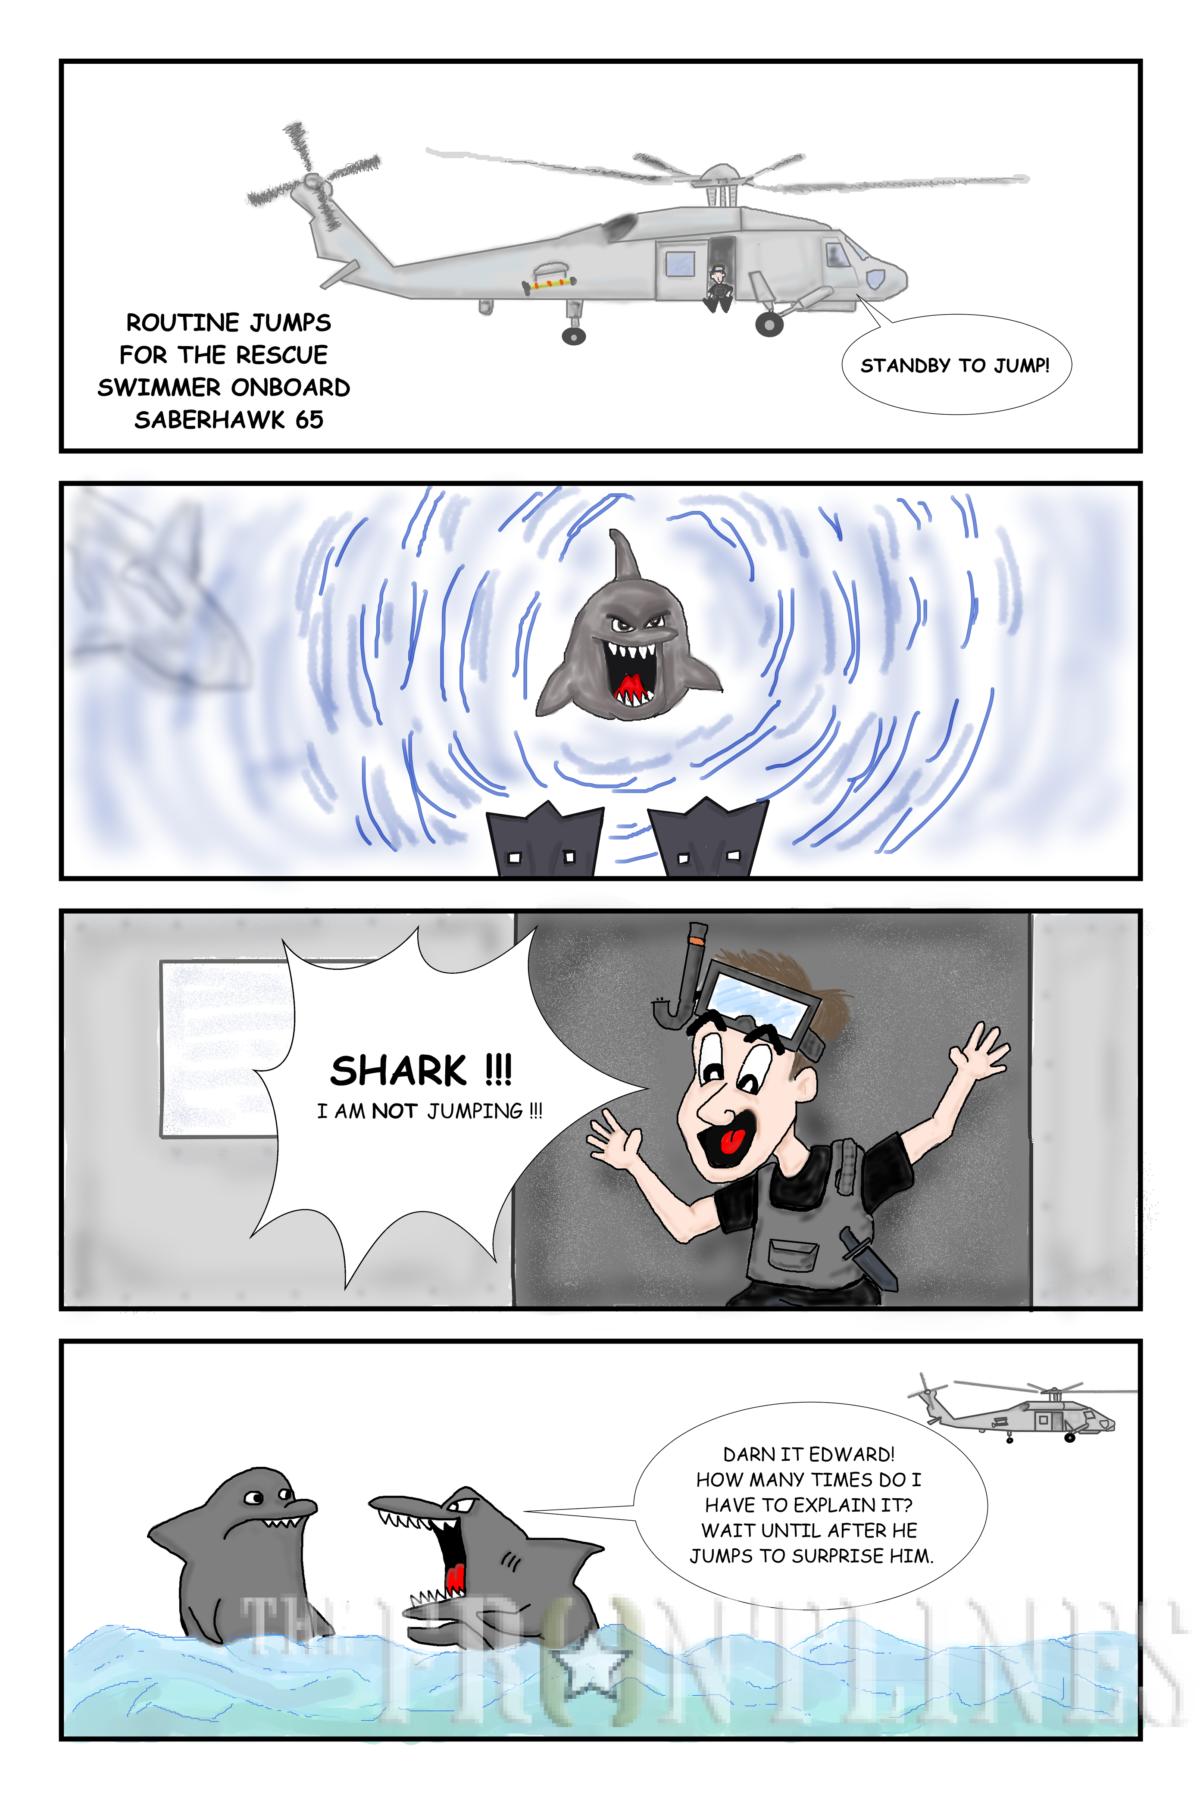 navy-humor-rescue-swimmer